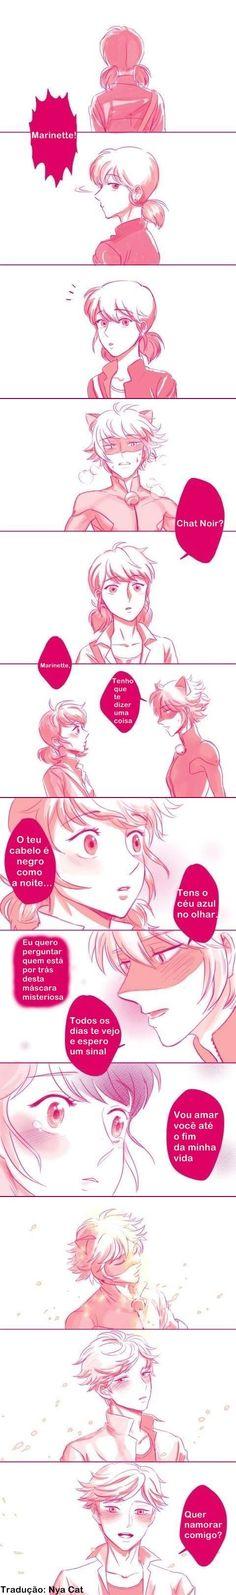 Miraculous - Marinette e Chat Noir/Adrien Nya Cat, Anime Vs Cartoon, Miraculous Ladybug Memes, Cat Noir, Ladybug Comics, Romances, Mlb, Geek Stuff, Fan Art